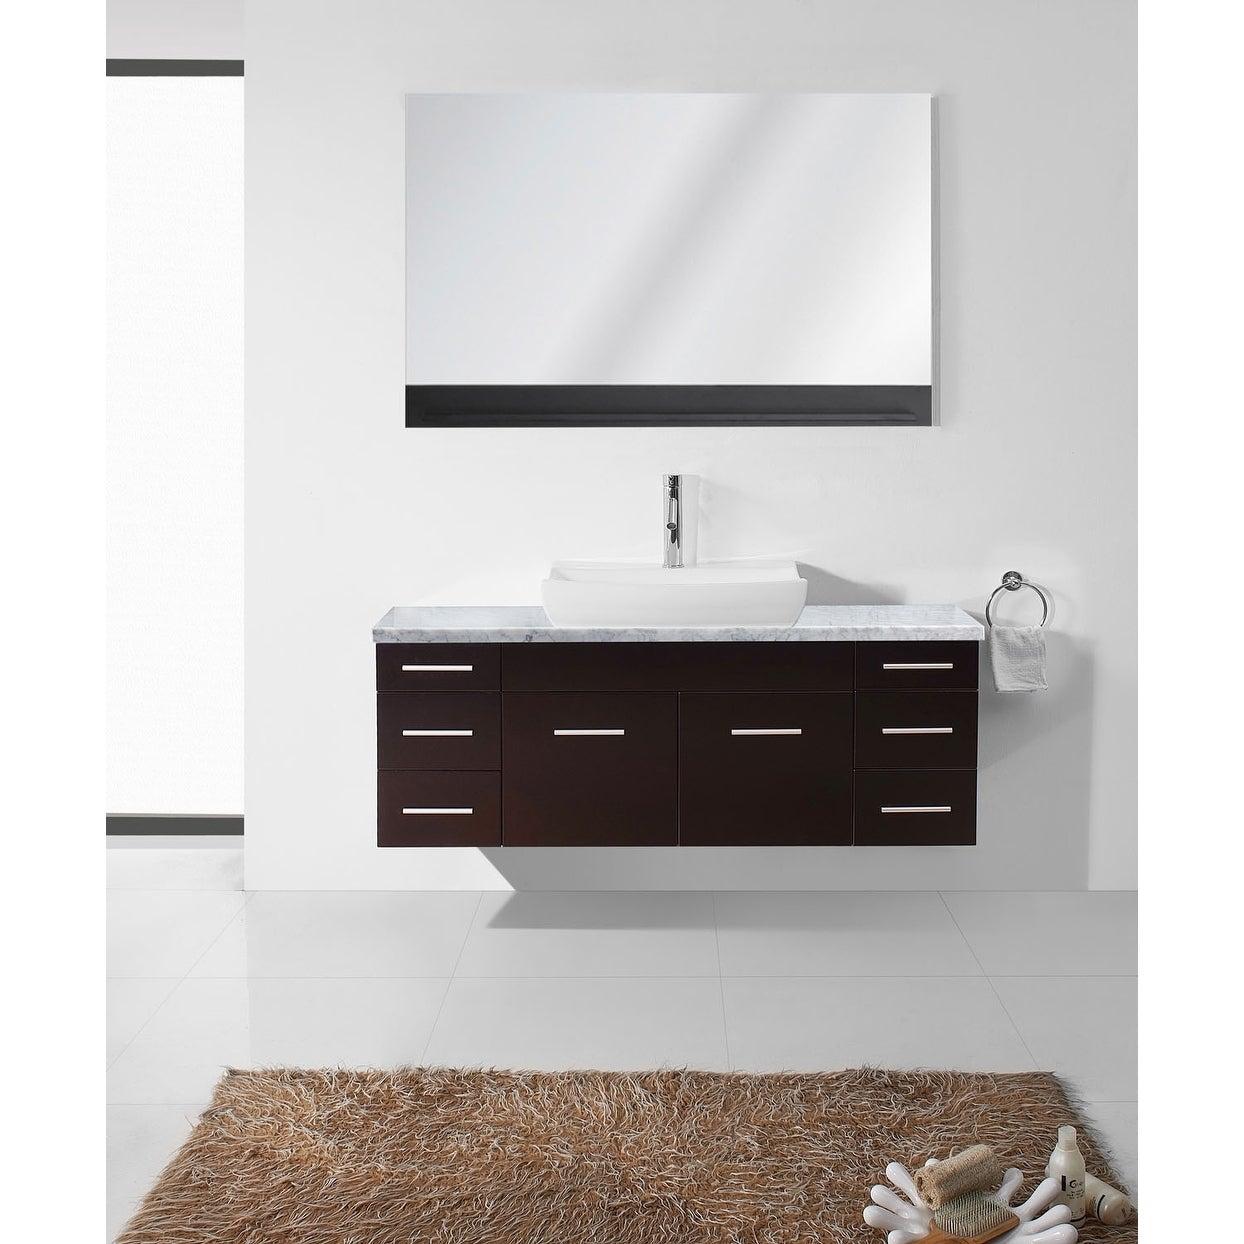 Shop Virtu USA Biagio 55-inch Italian Carrara White Marble Single ...